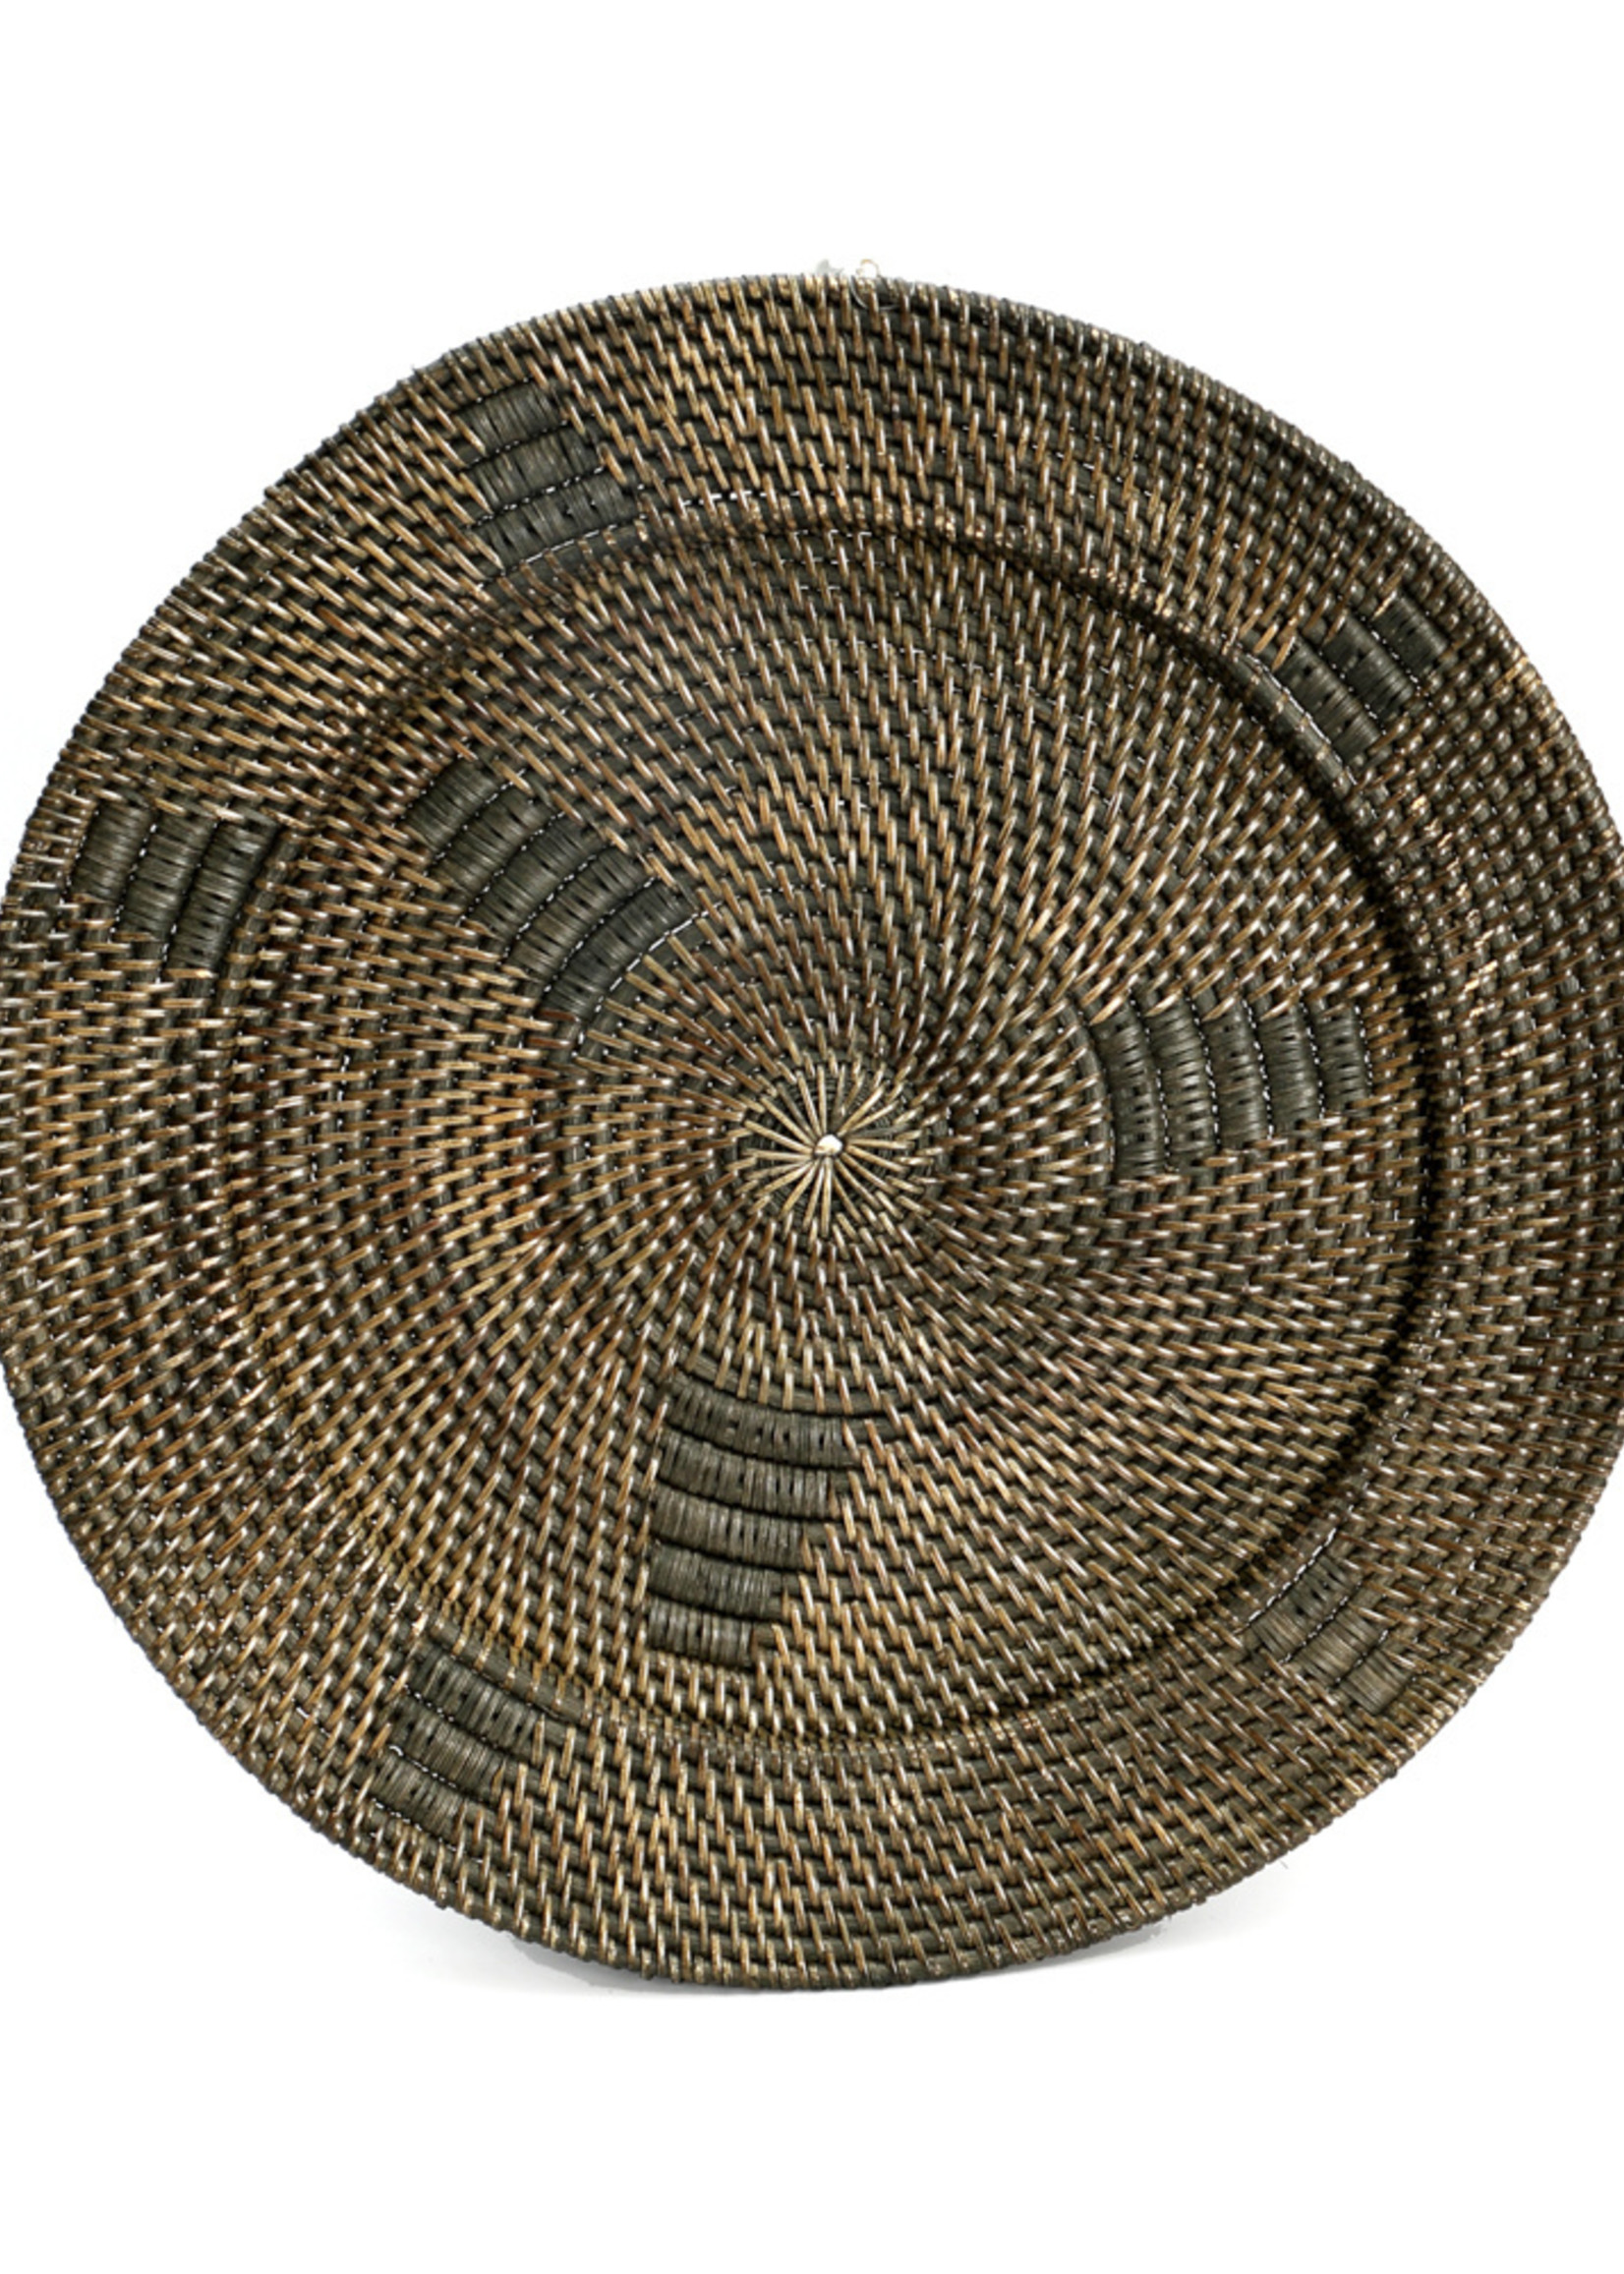 The Jasmine Plate - Brown - M